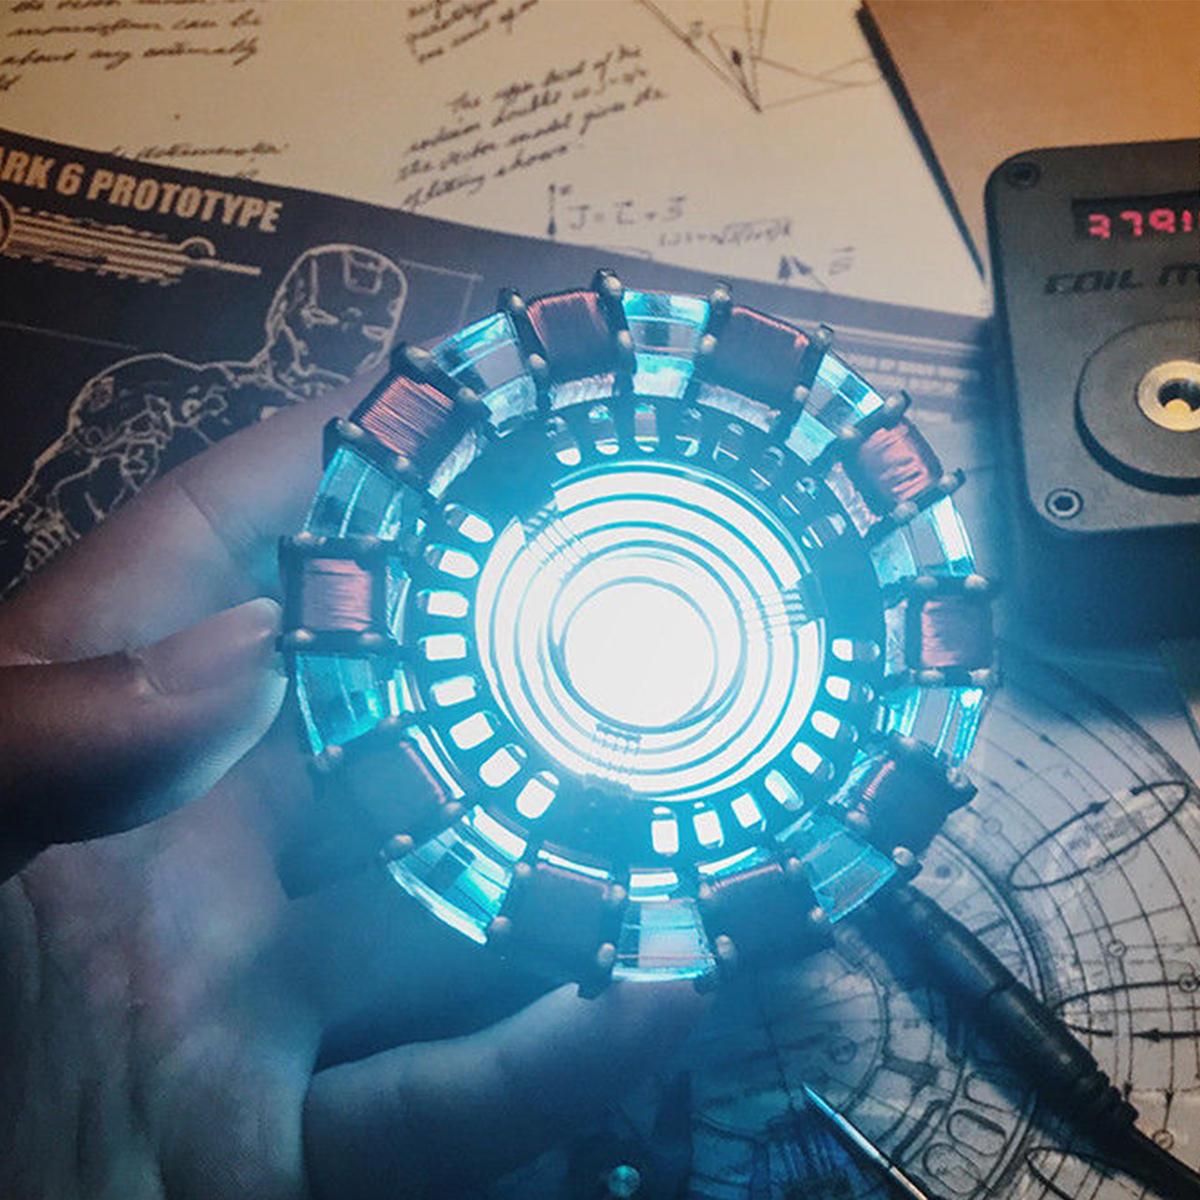 Lampka Led DIY Reaktor łukowy IRON MAN / TONY STARK $19.99